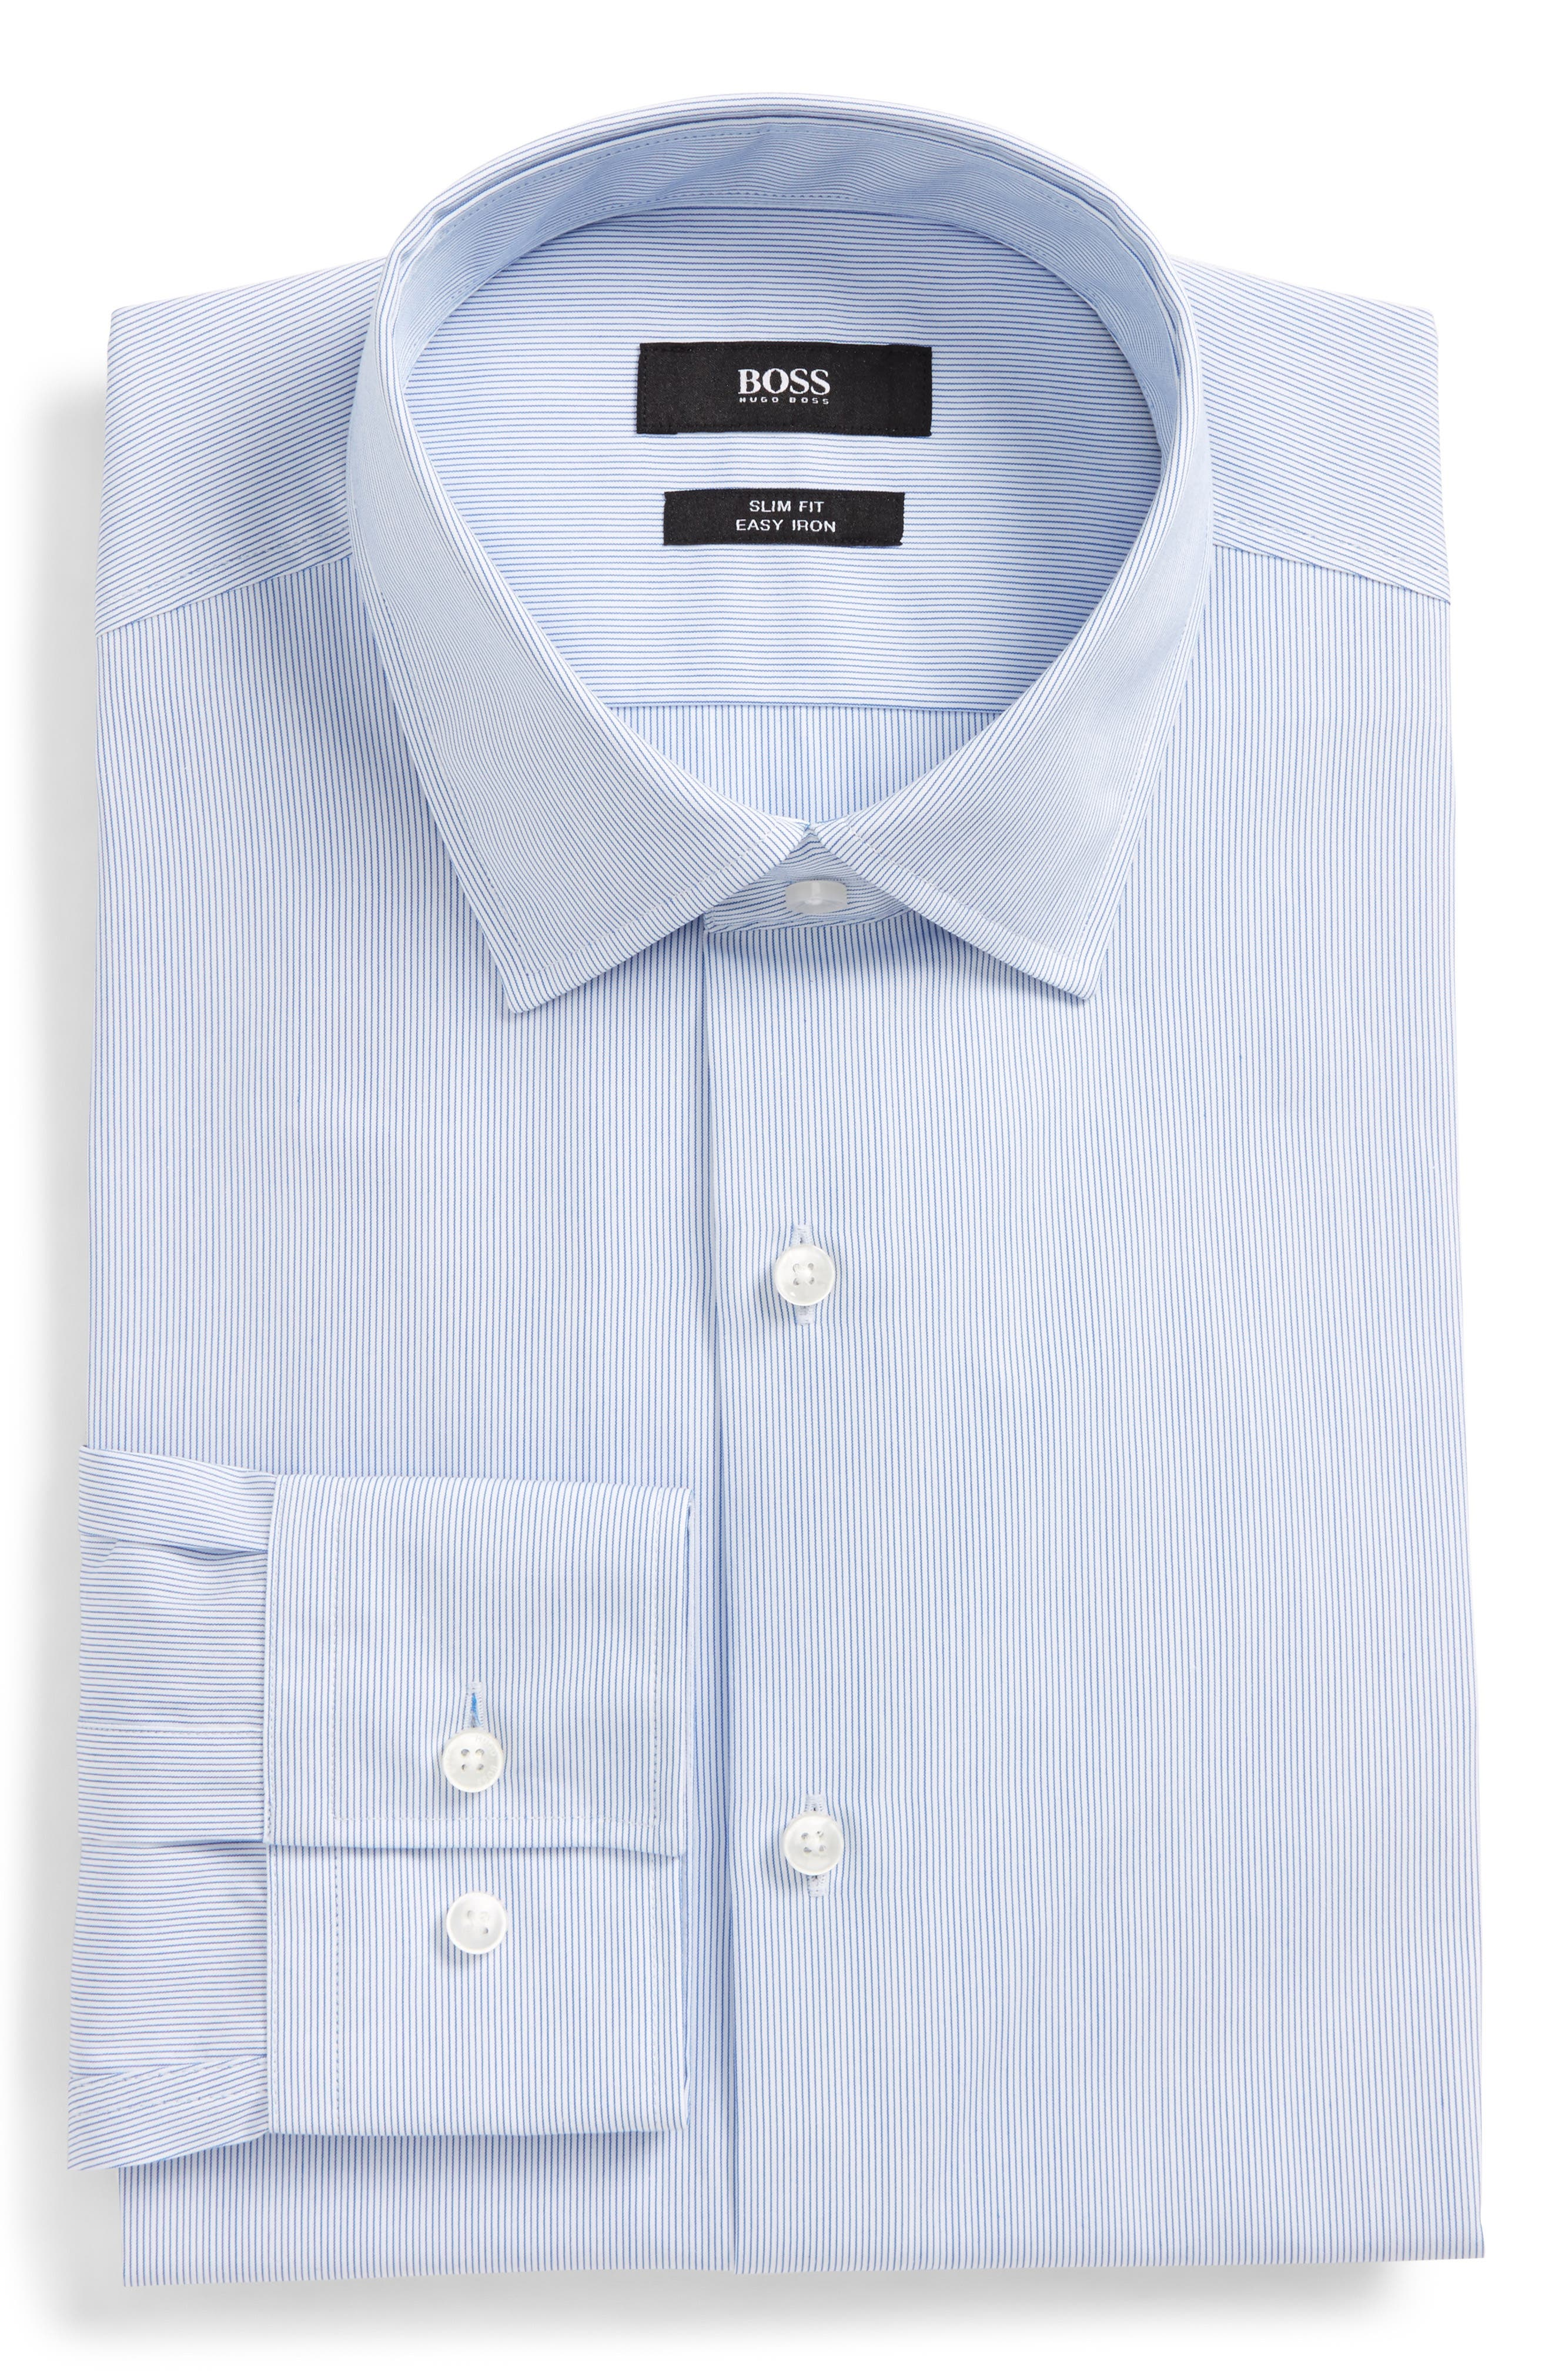 Main Image - BOSS Jenno Slim Fit Easy Iron Stripe Dress Shirt